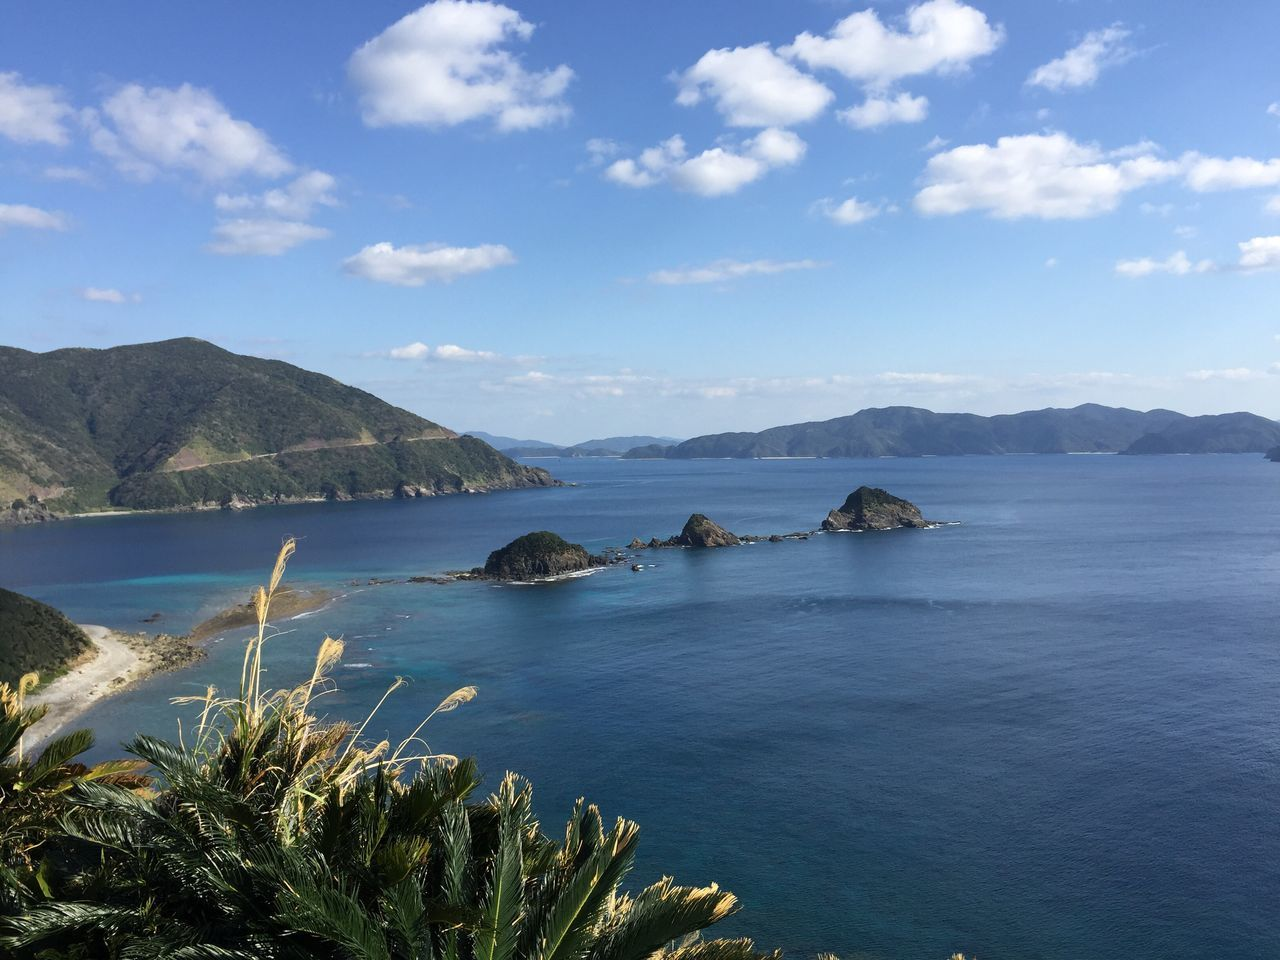 Mountain Sky Sea Nature Scenics Beauty In Nature Water Outdoors Day Landscape No People Smallisland Tinyisland Islands Kagoshima Amami Island